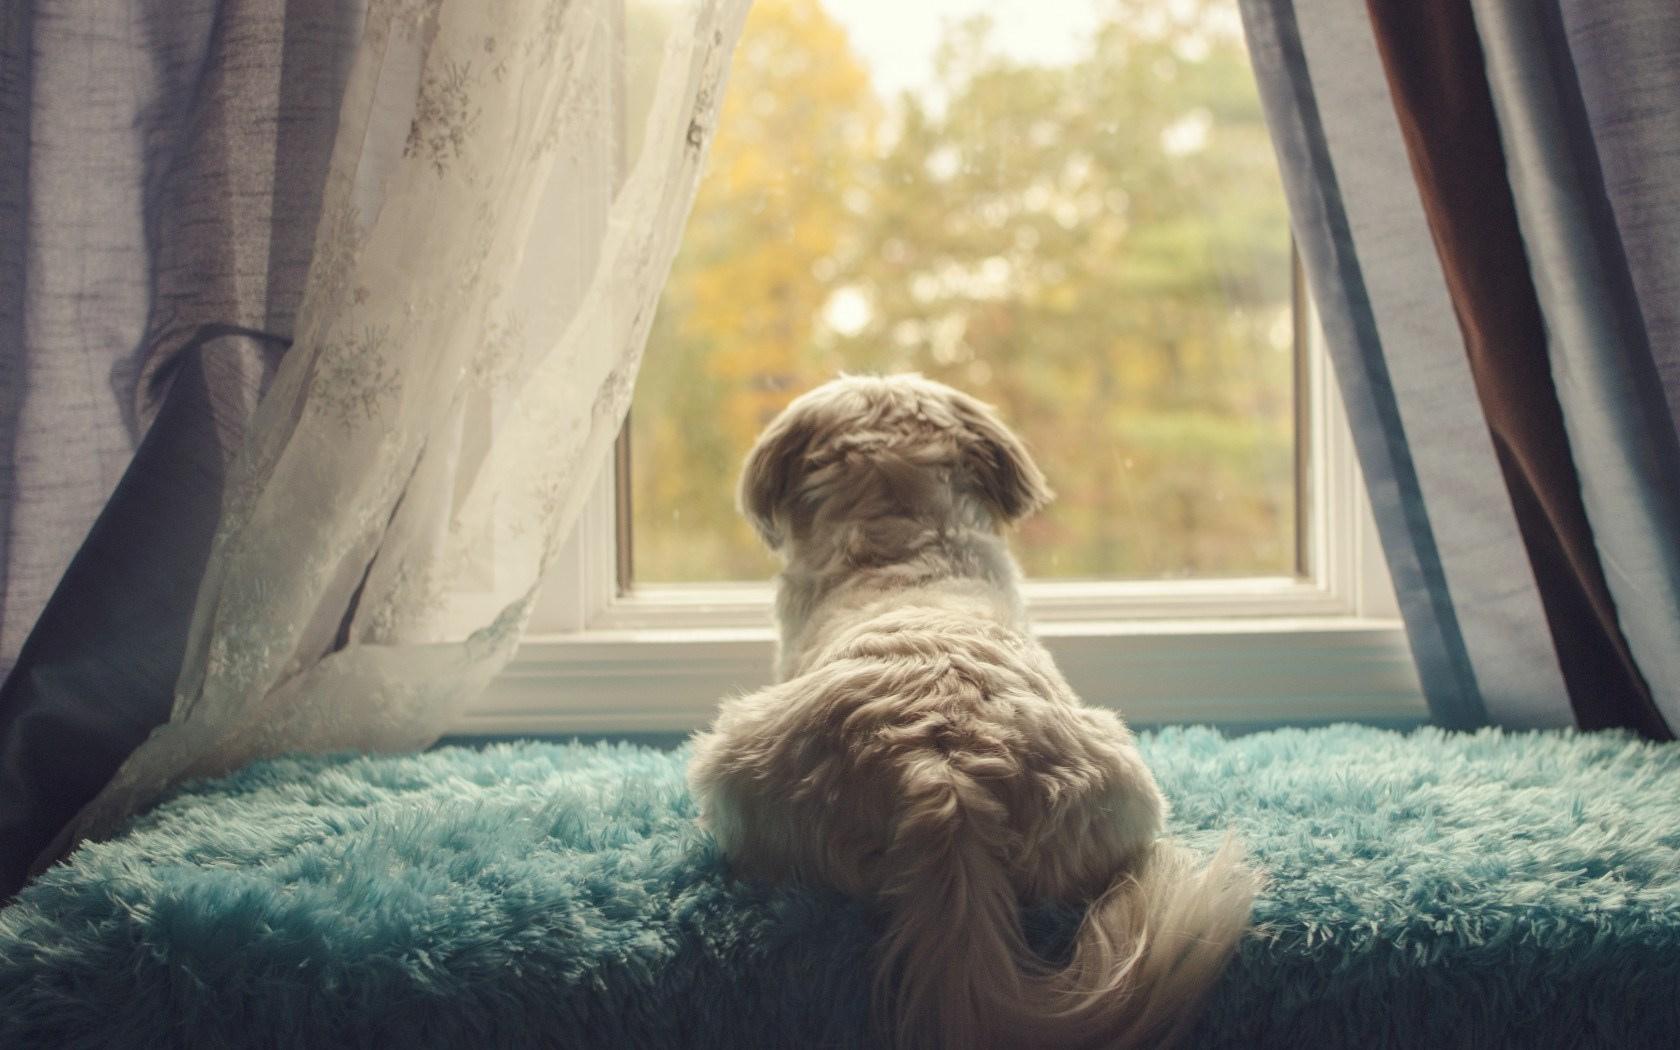 dog-window-dreaming-wallpaper-1680x1050